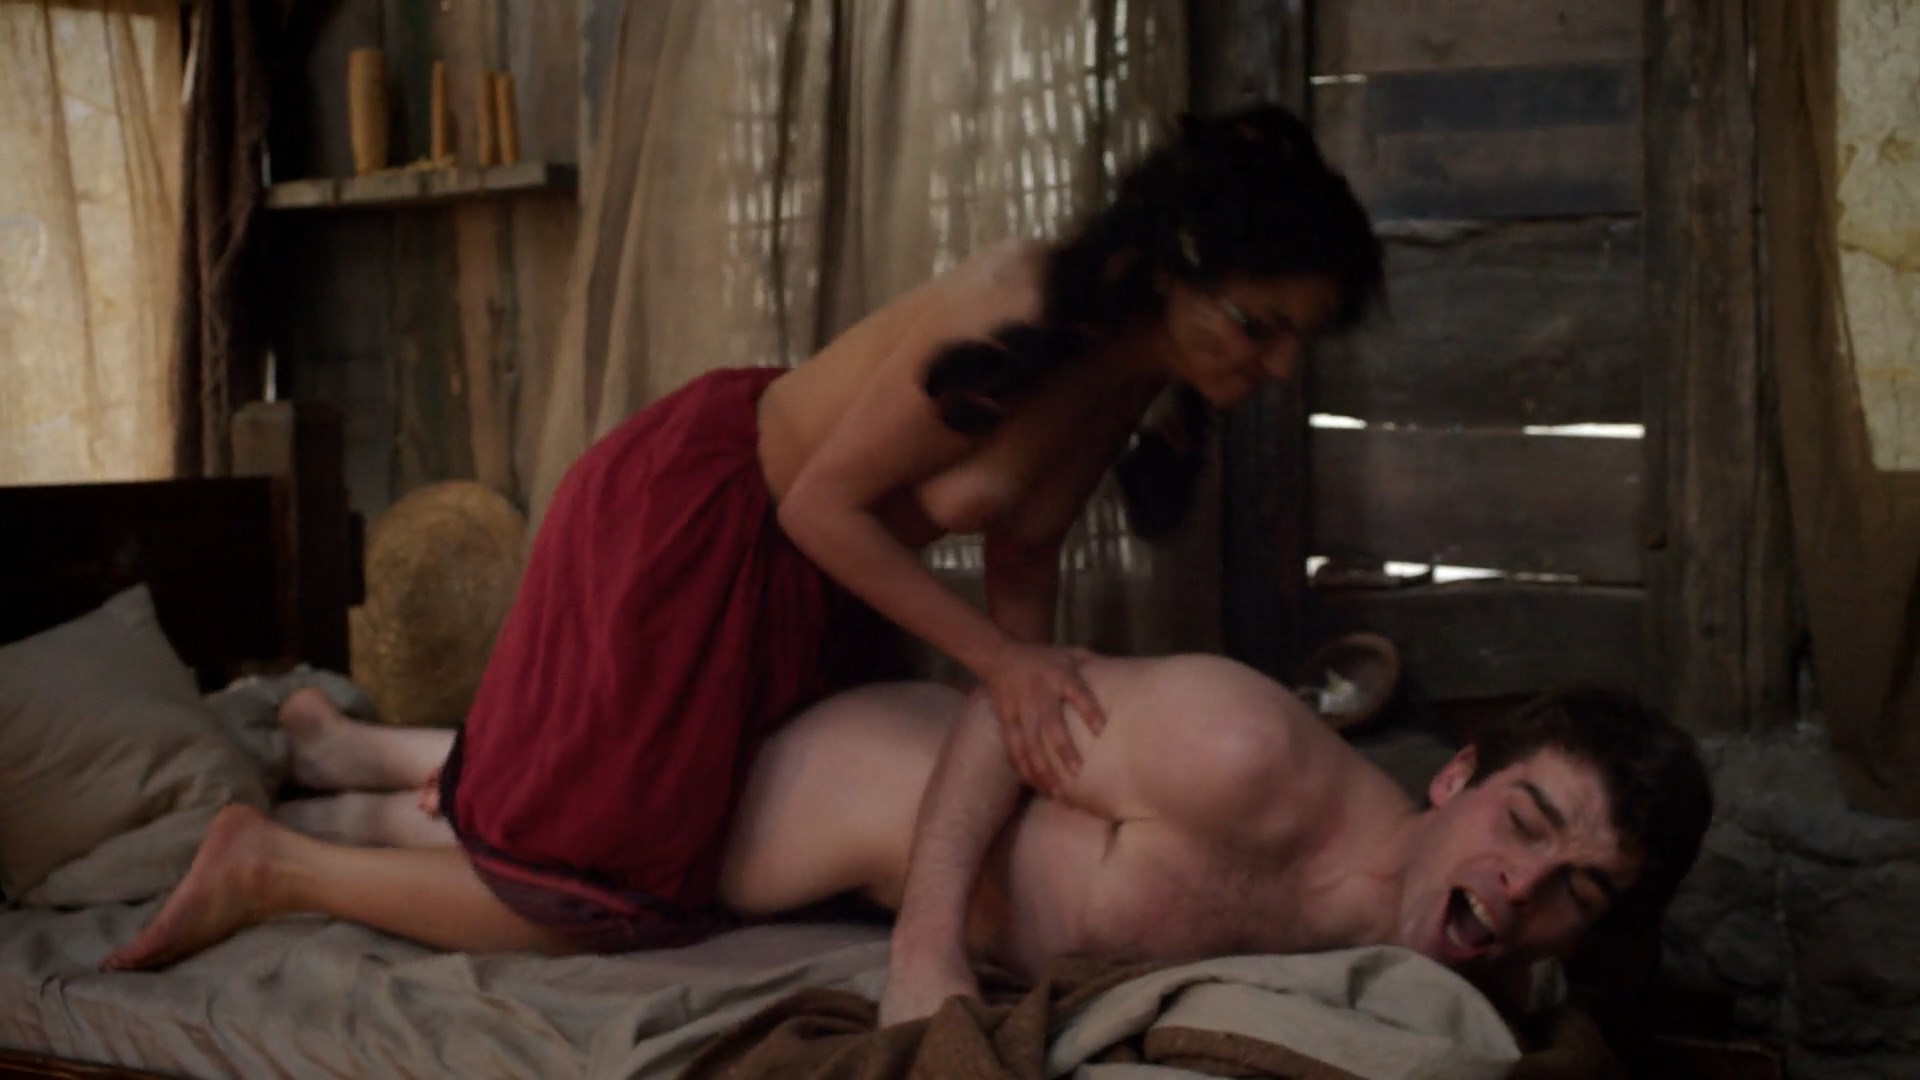 Amber Rose Porn Movie watch online - amber rose revah – borgia s01e07-11 (2011) hd